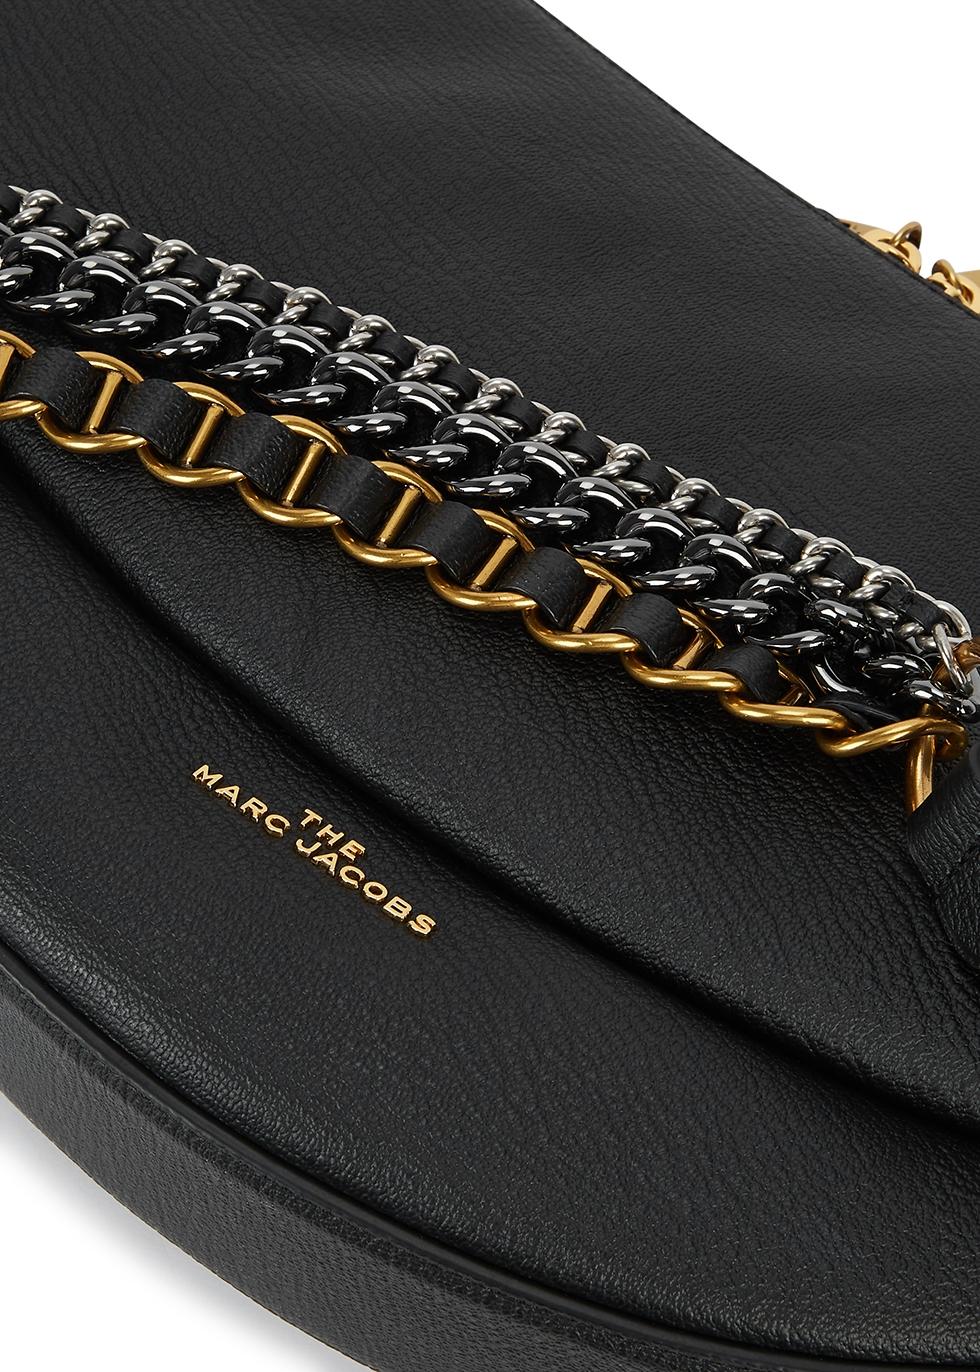 Marc Jacobs The Eclipse mini black leather shoulder bag